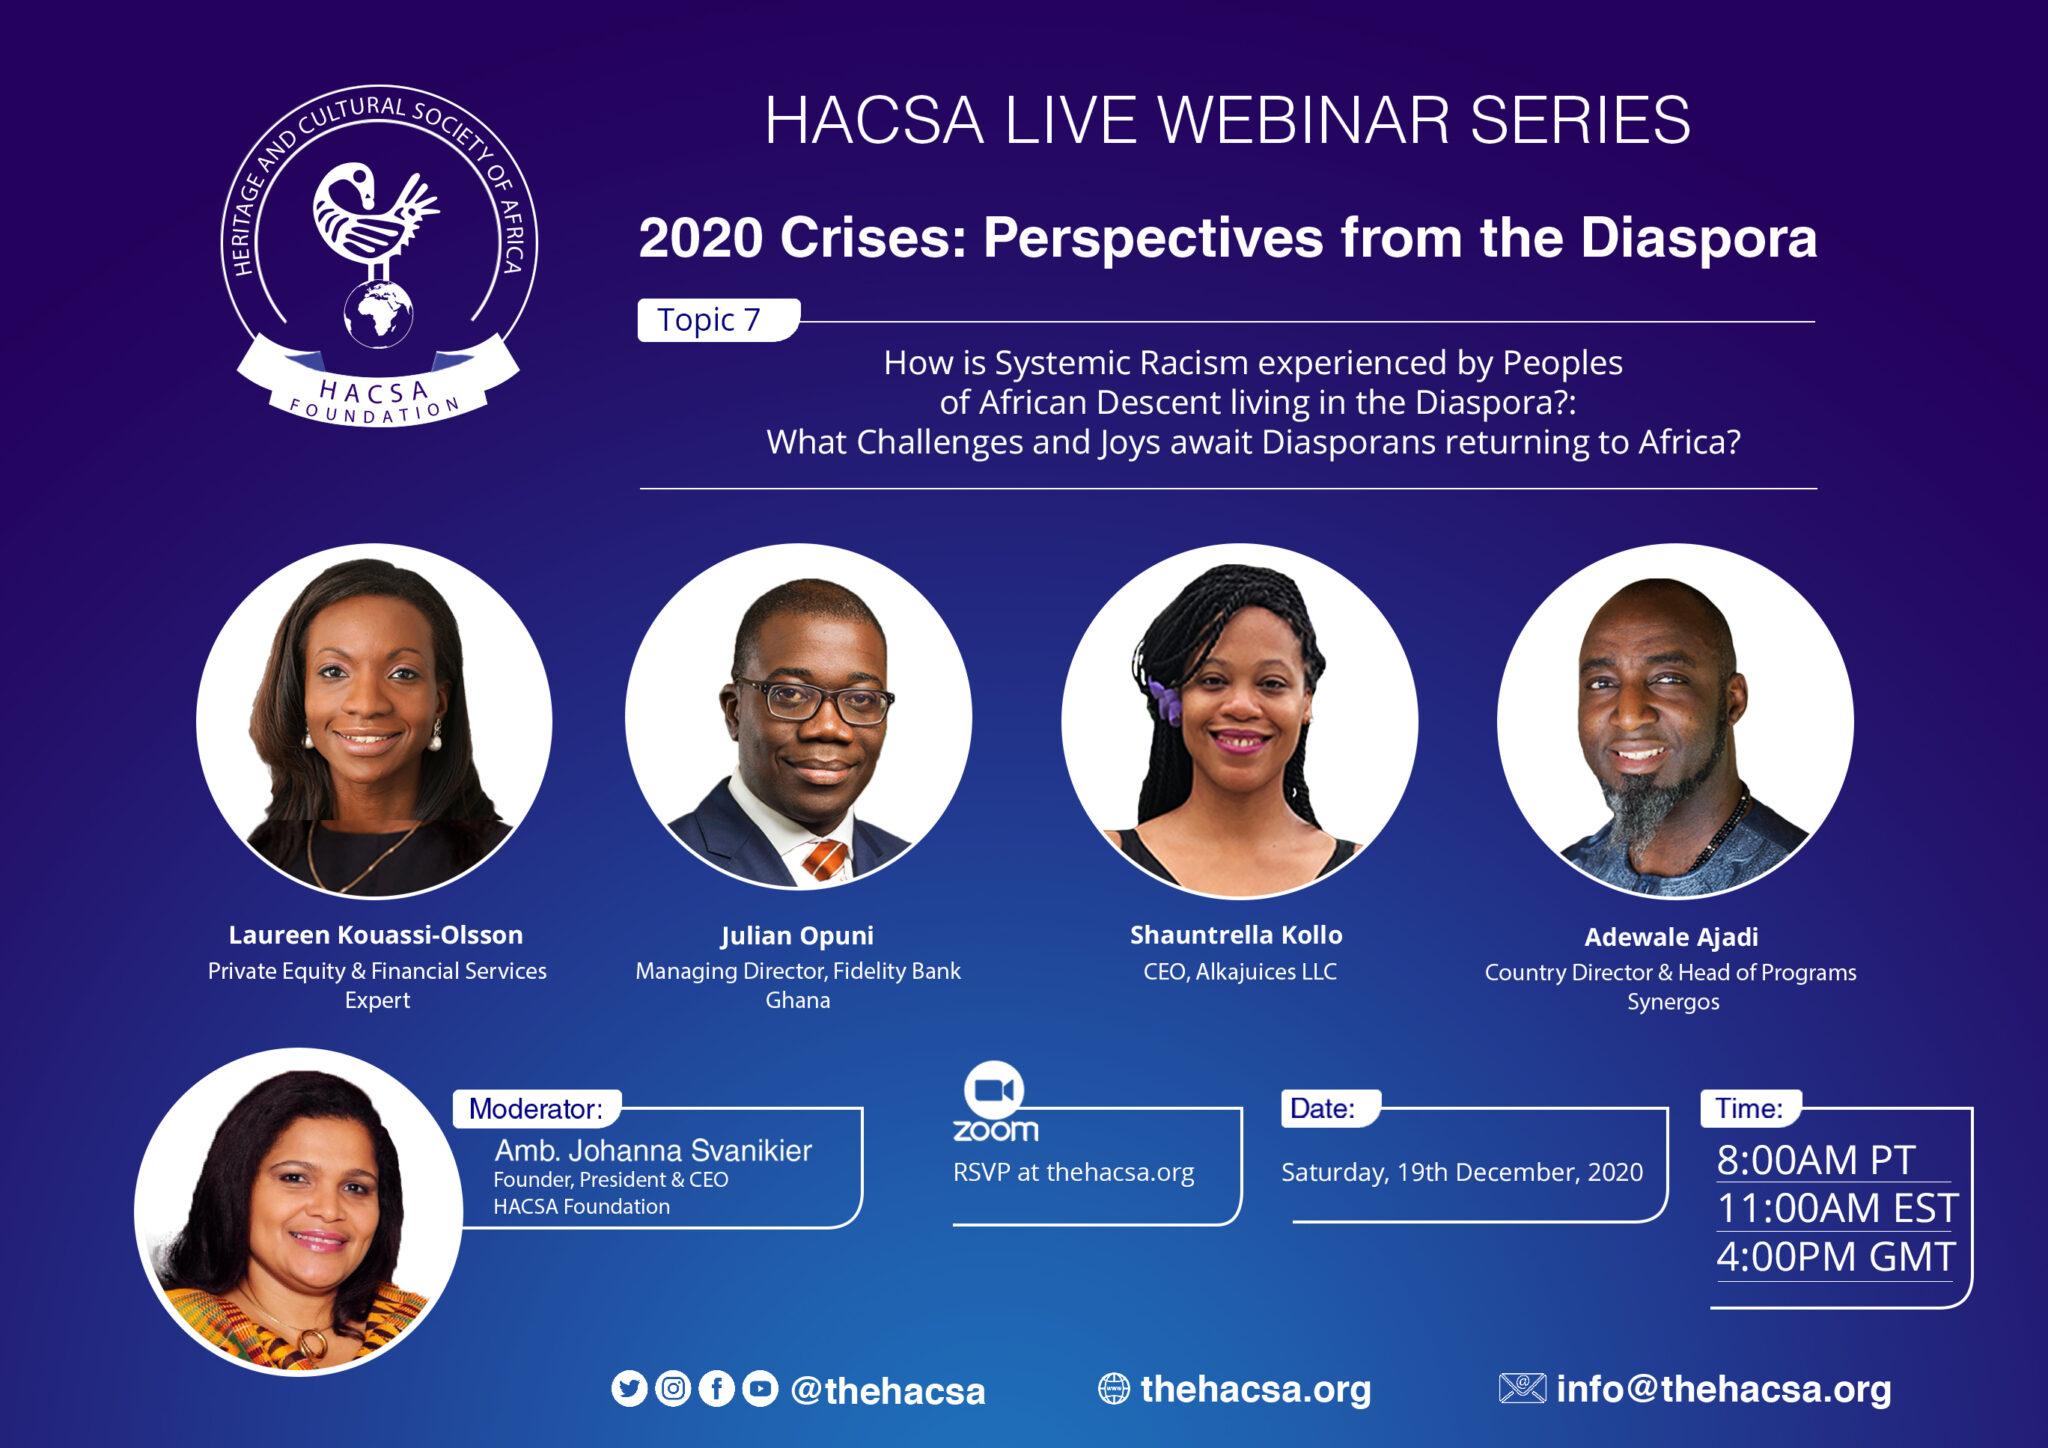 COVID-19: A Comparison of its Impact & Treatment in Africa & the Diaspora